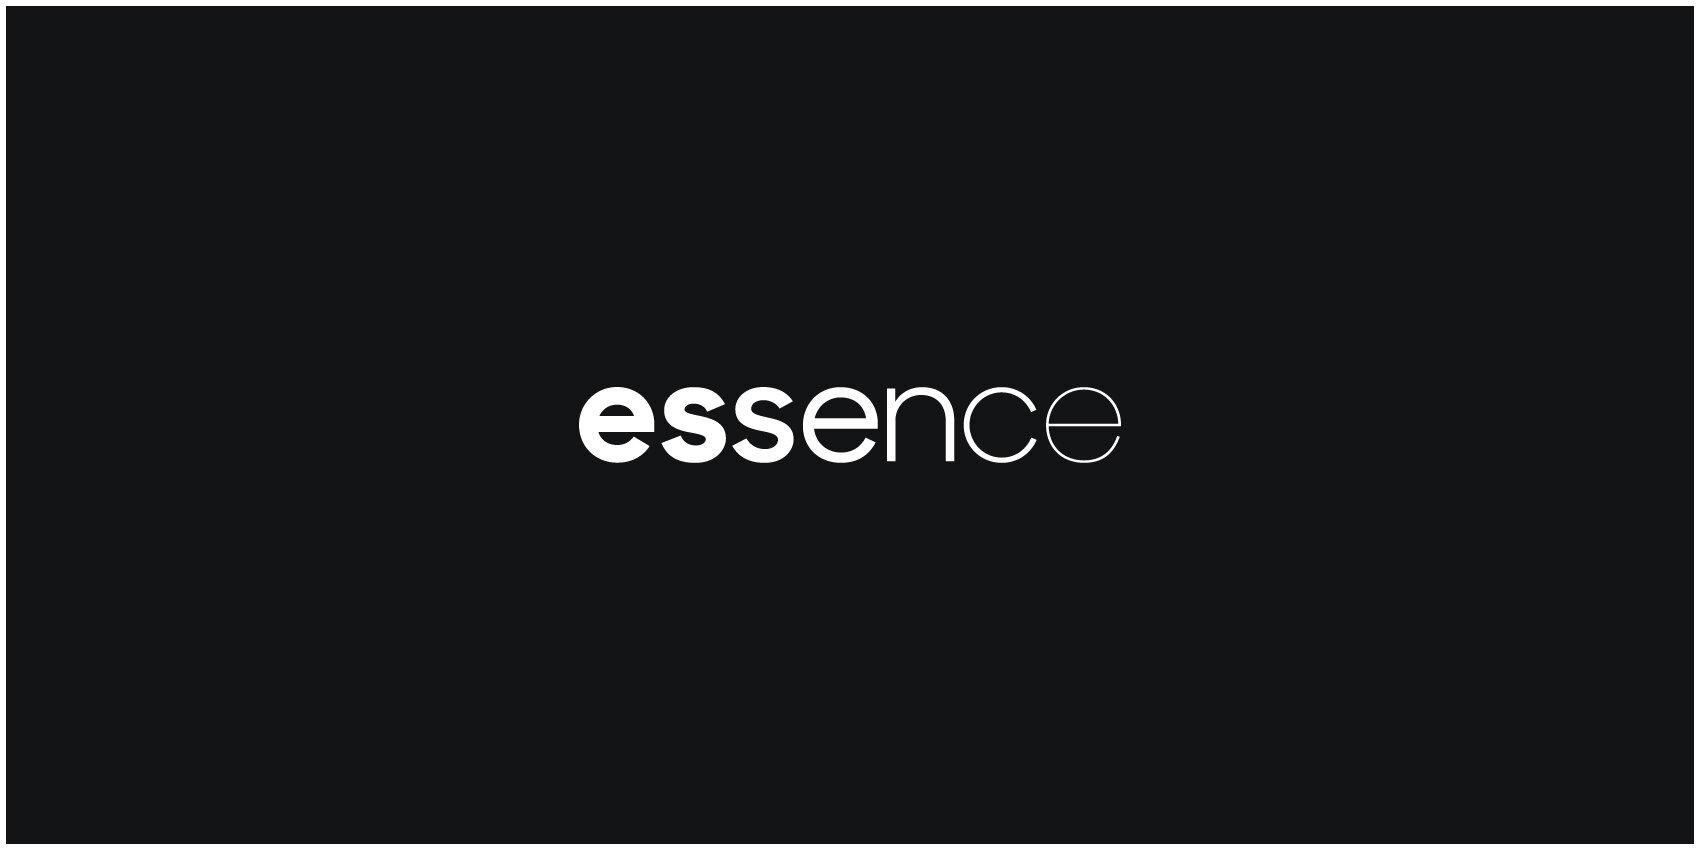 Essence-02.jpg